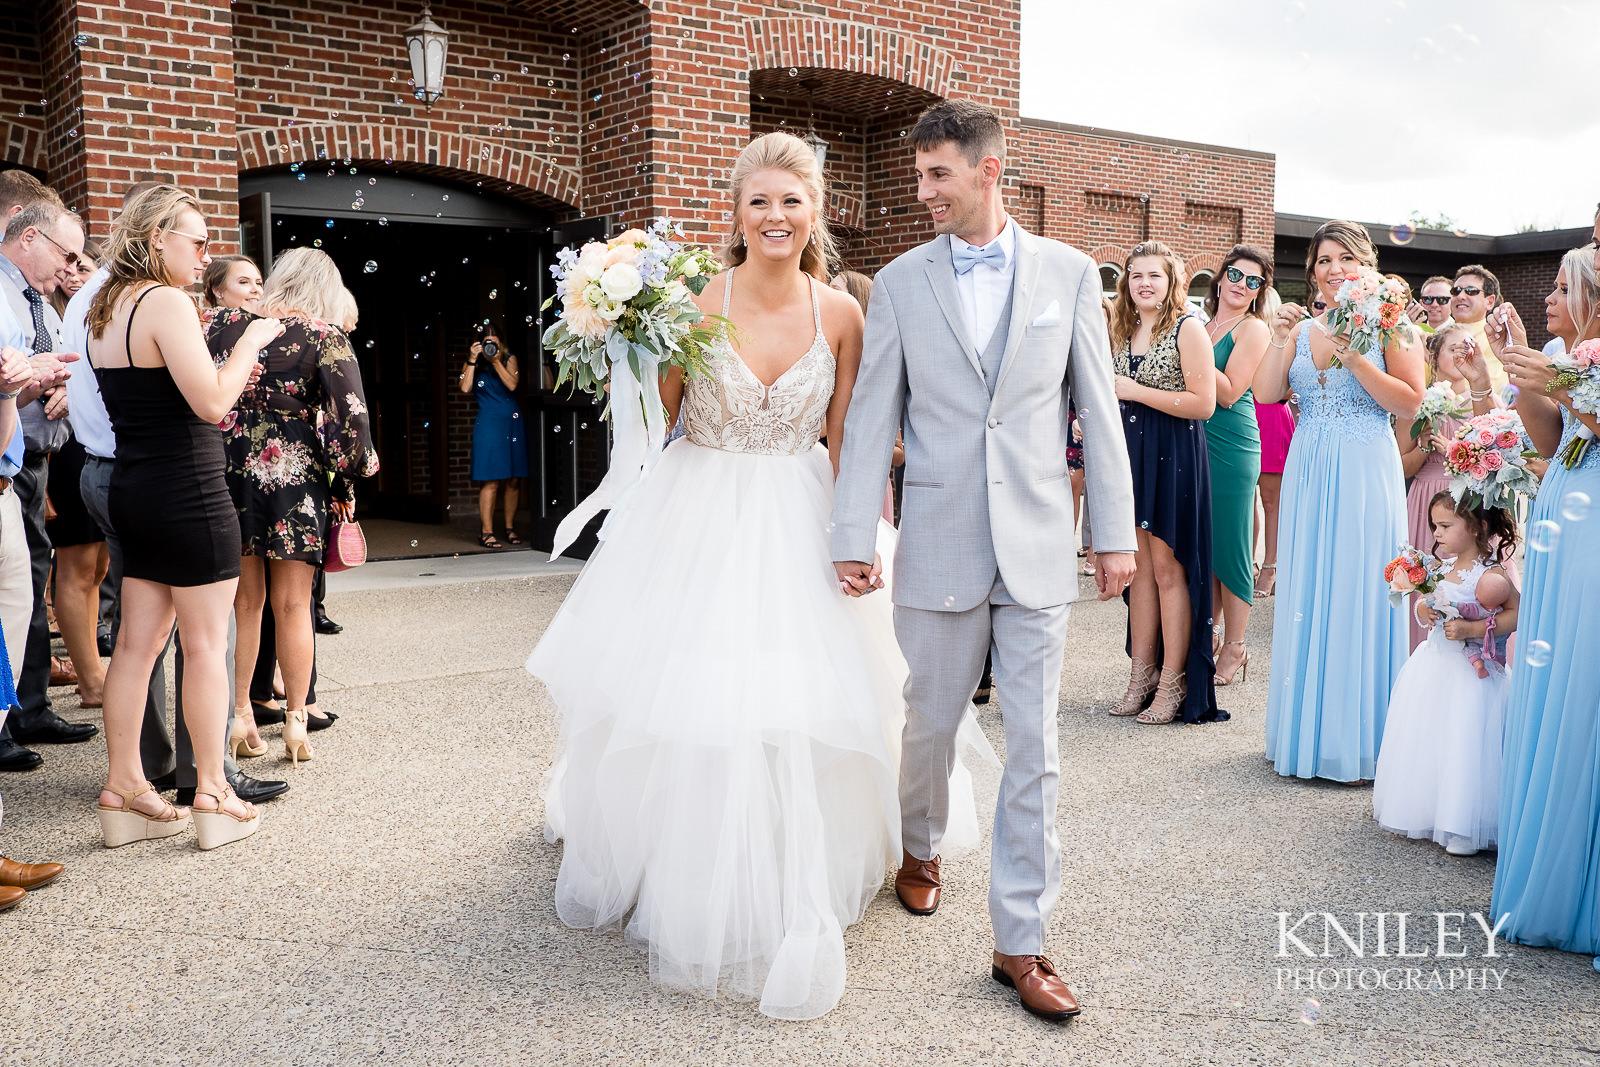 063 - Buffalo NY wedding pictures - St Marys Church - XT2A7048.jpg